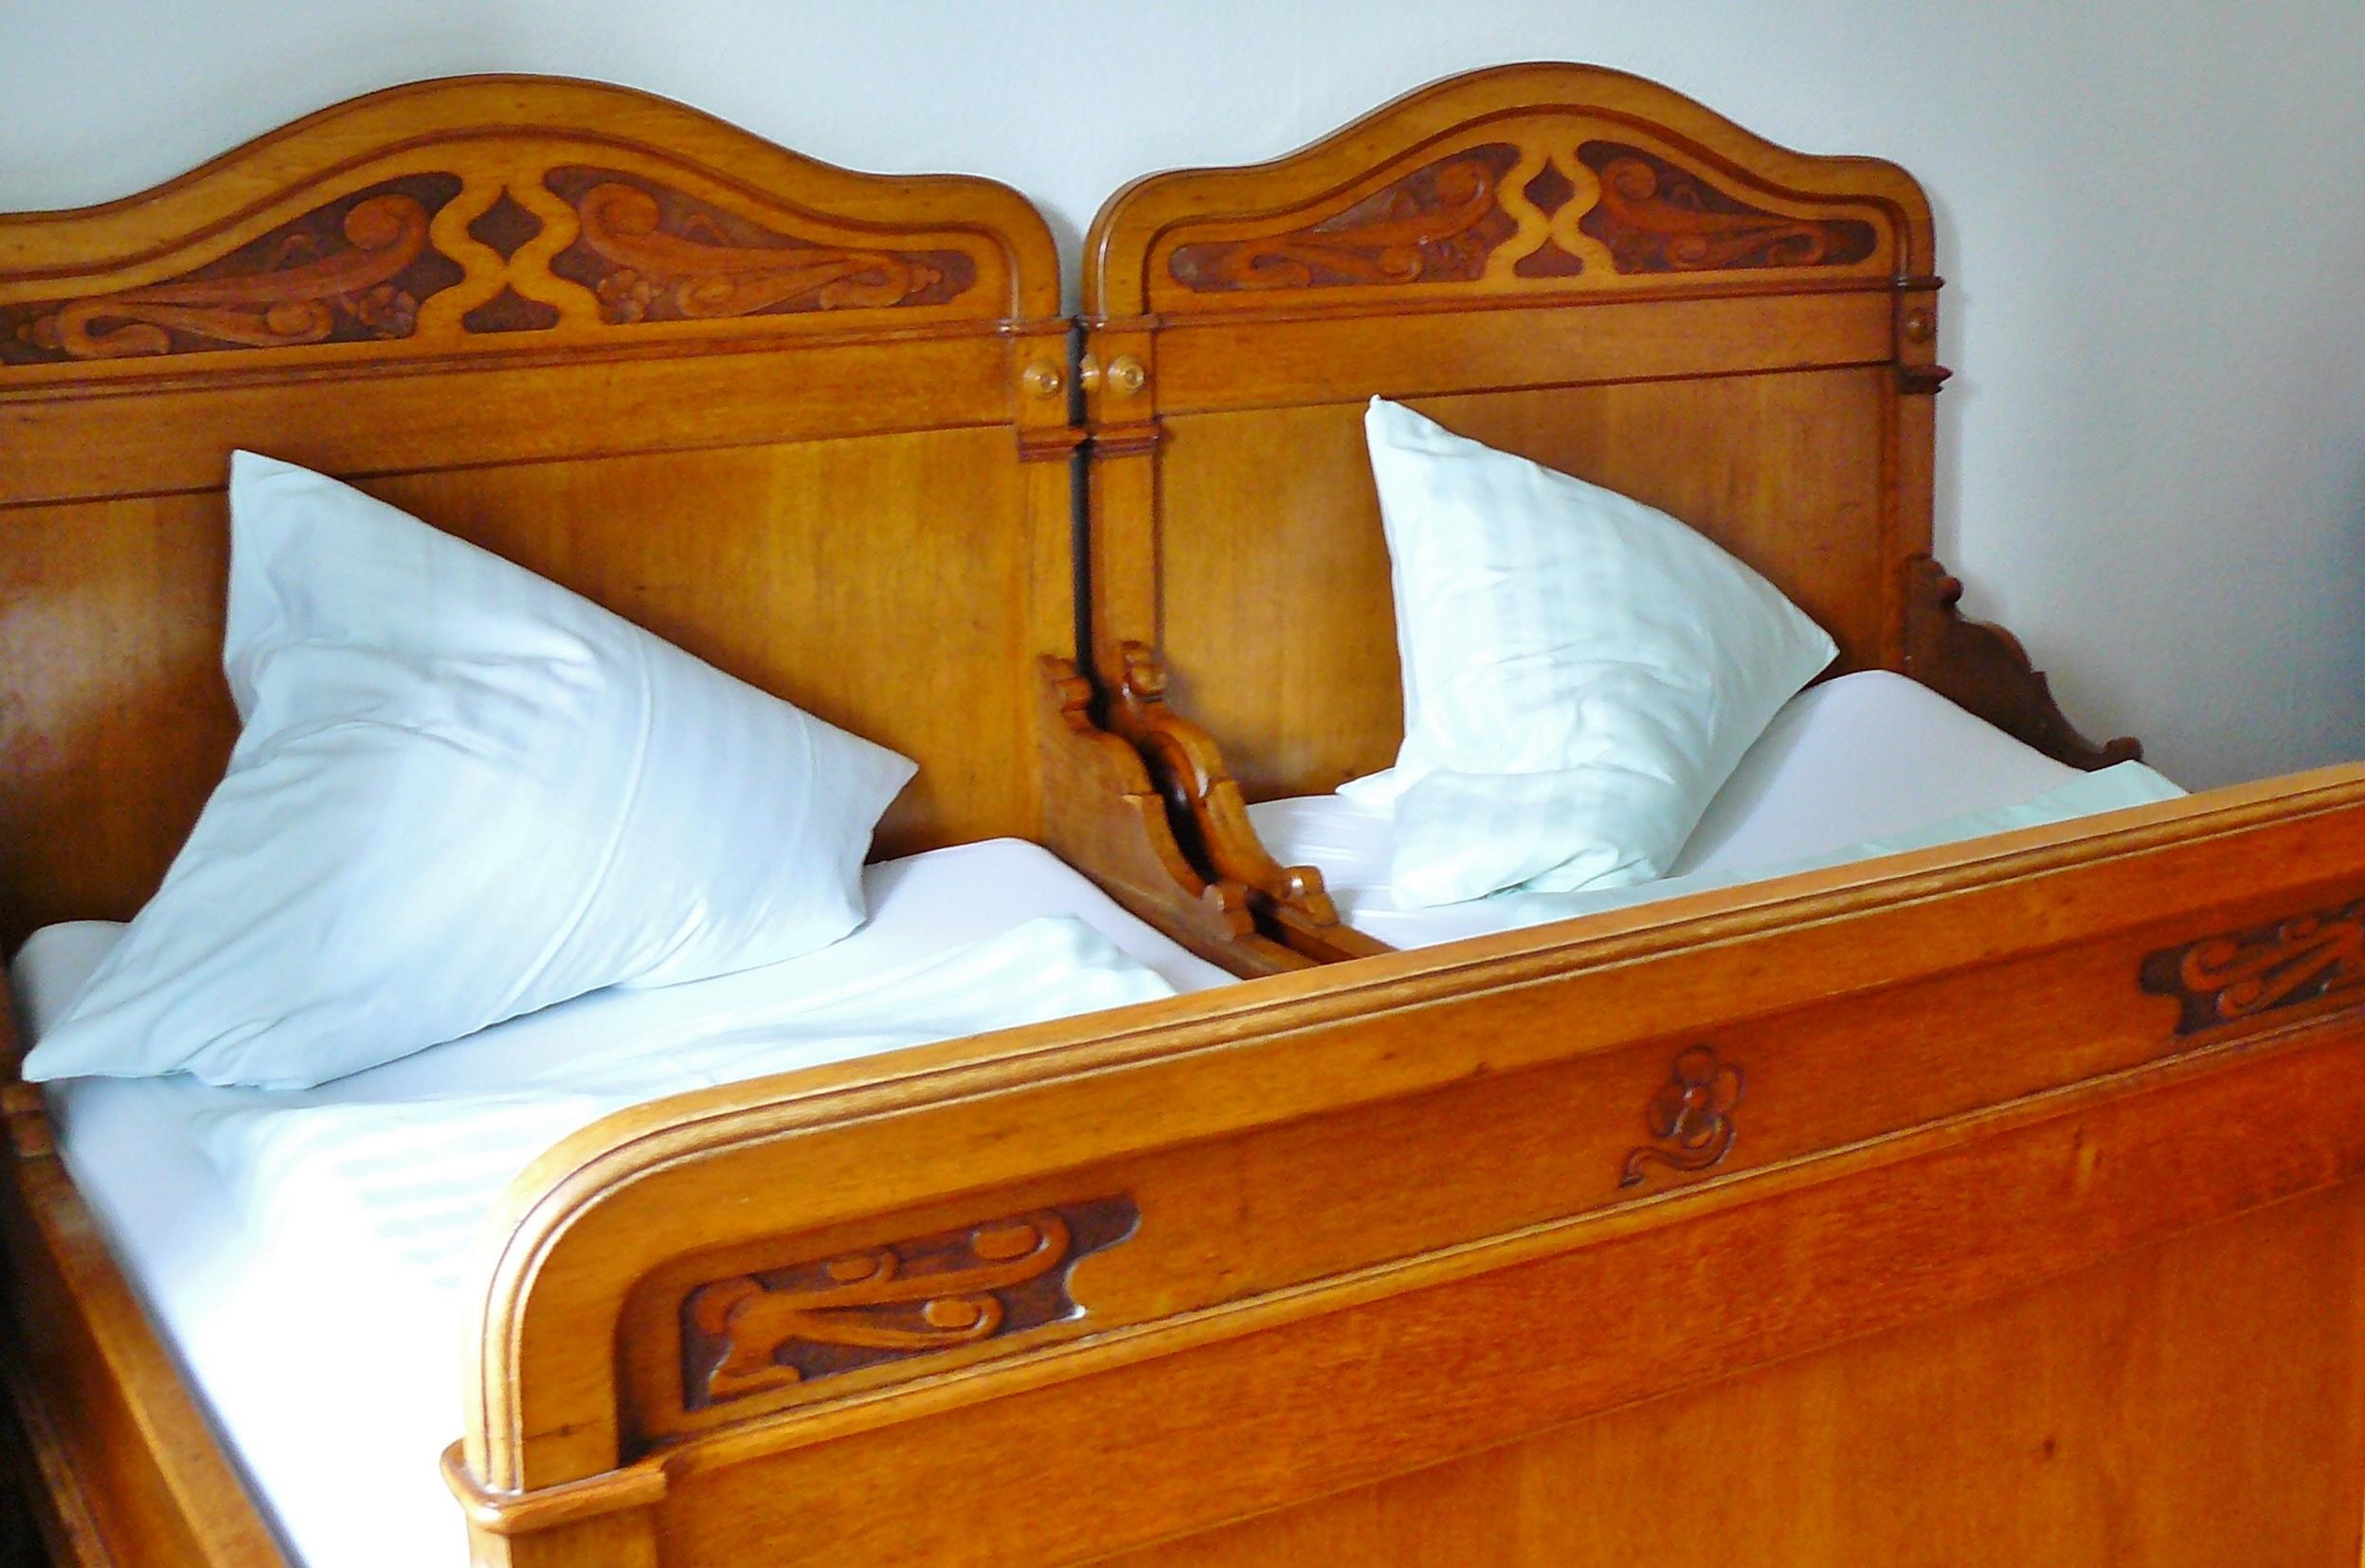 Fotos Gratis Antiguo Nostalgia Mueble Habitaci N Almohada  # Muebles Tallados En Madera